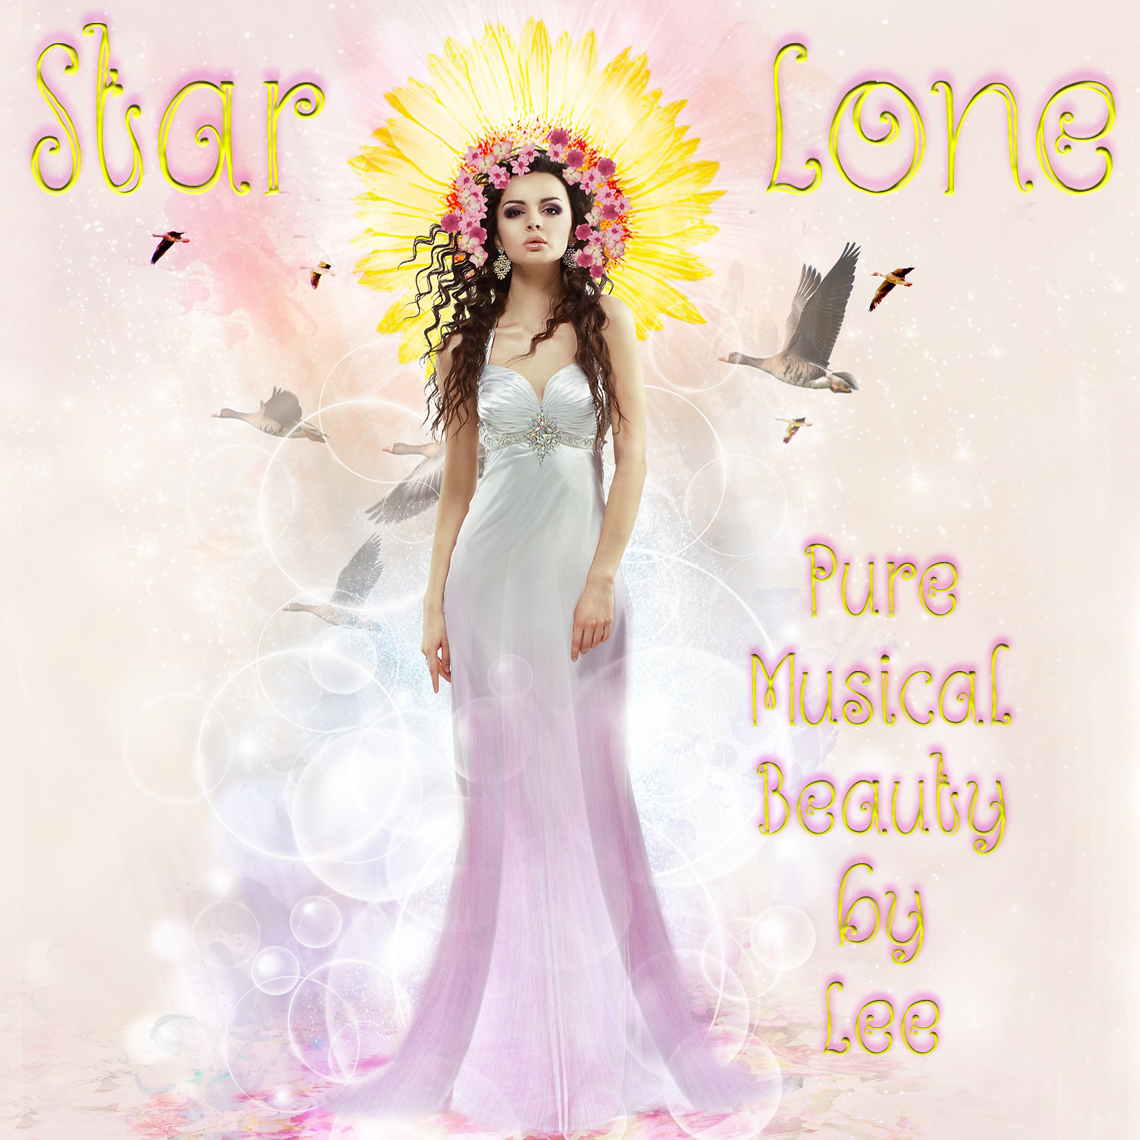 Star Lone